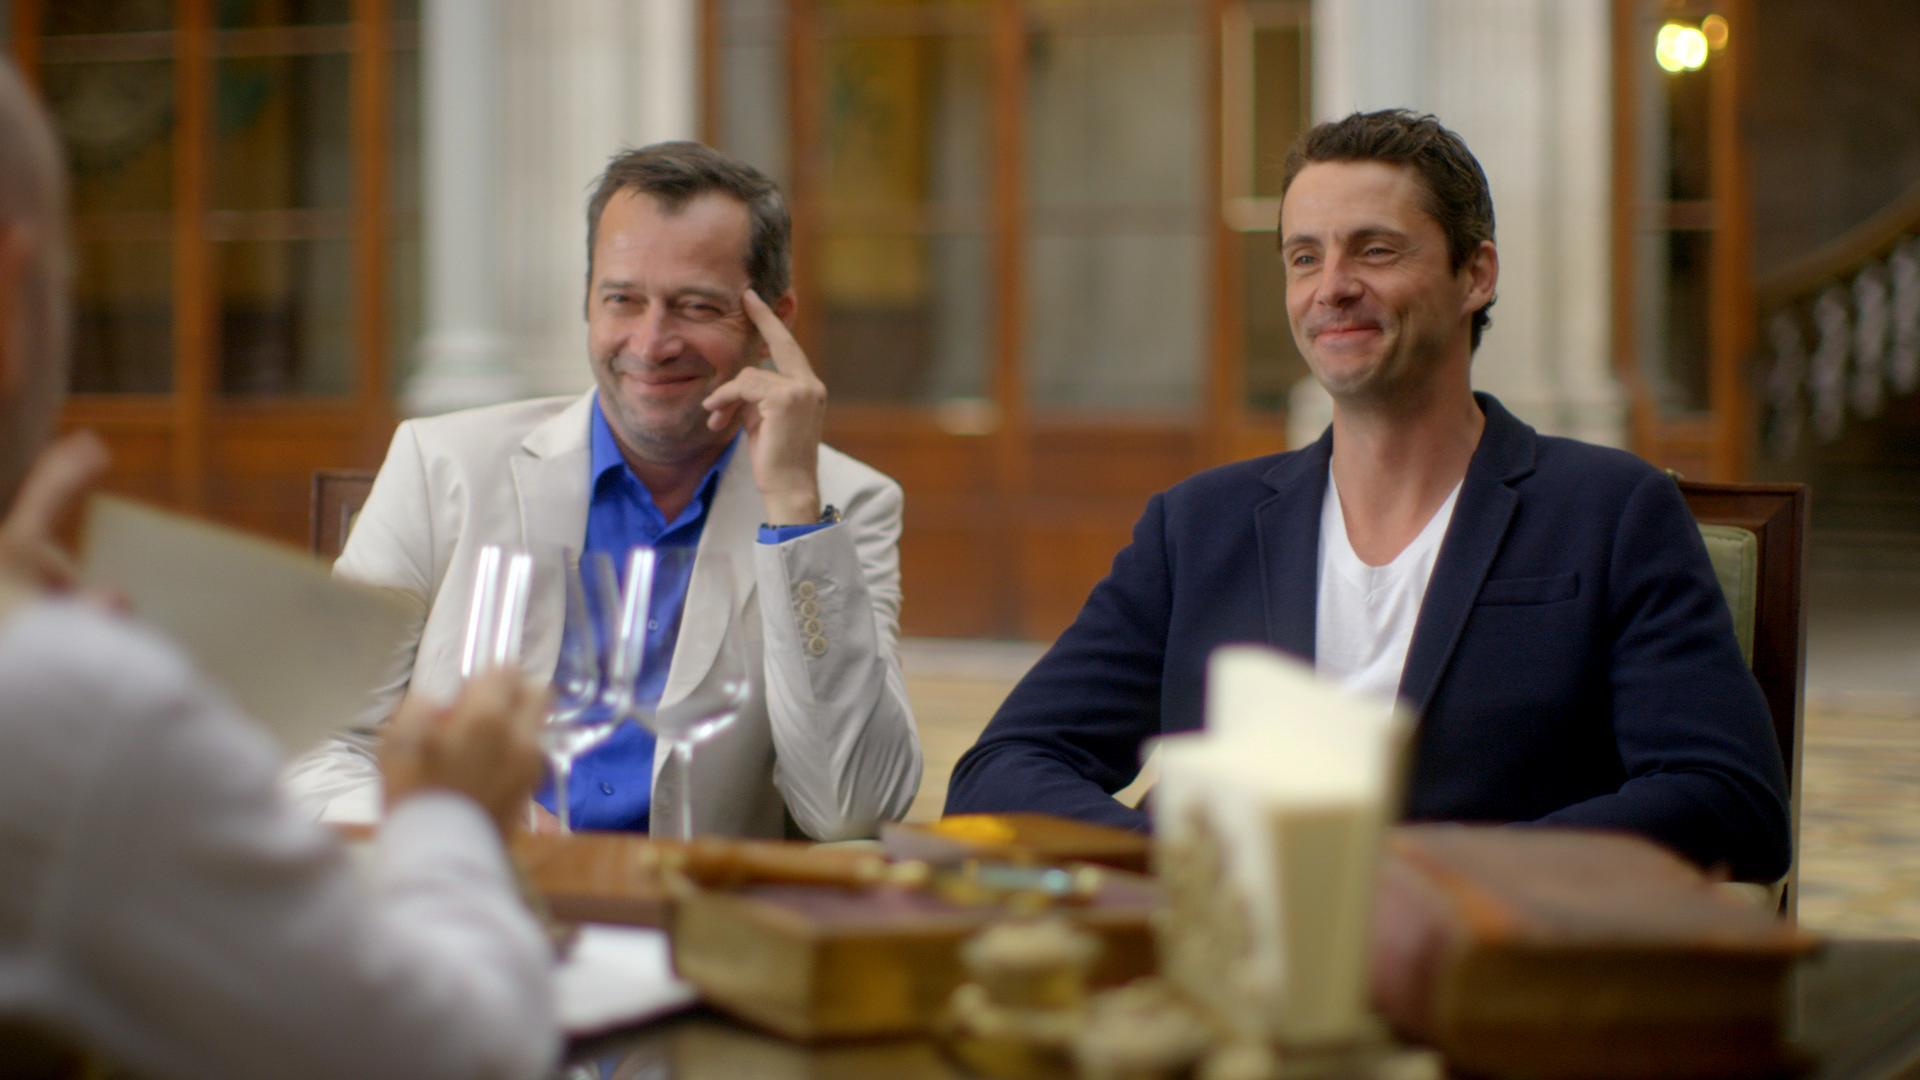 The Wine Show Season 3 Matthew Goode James Purefoy